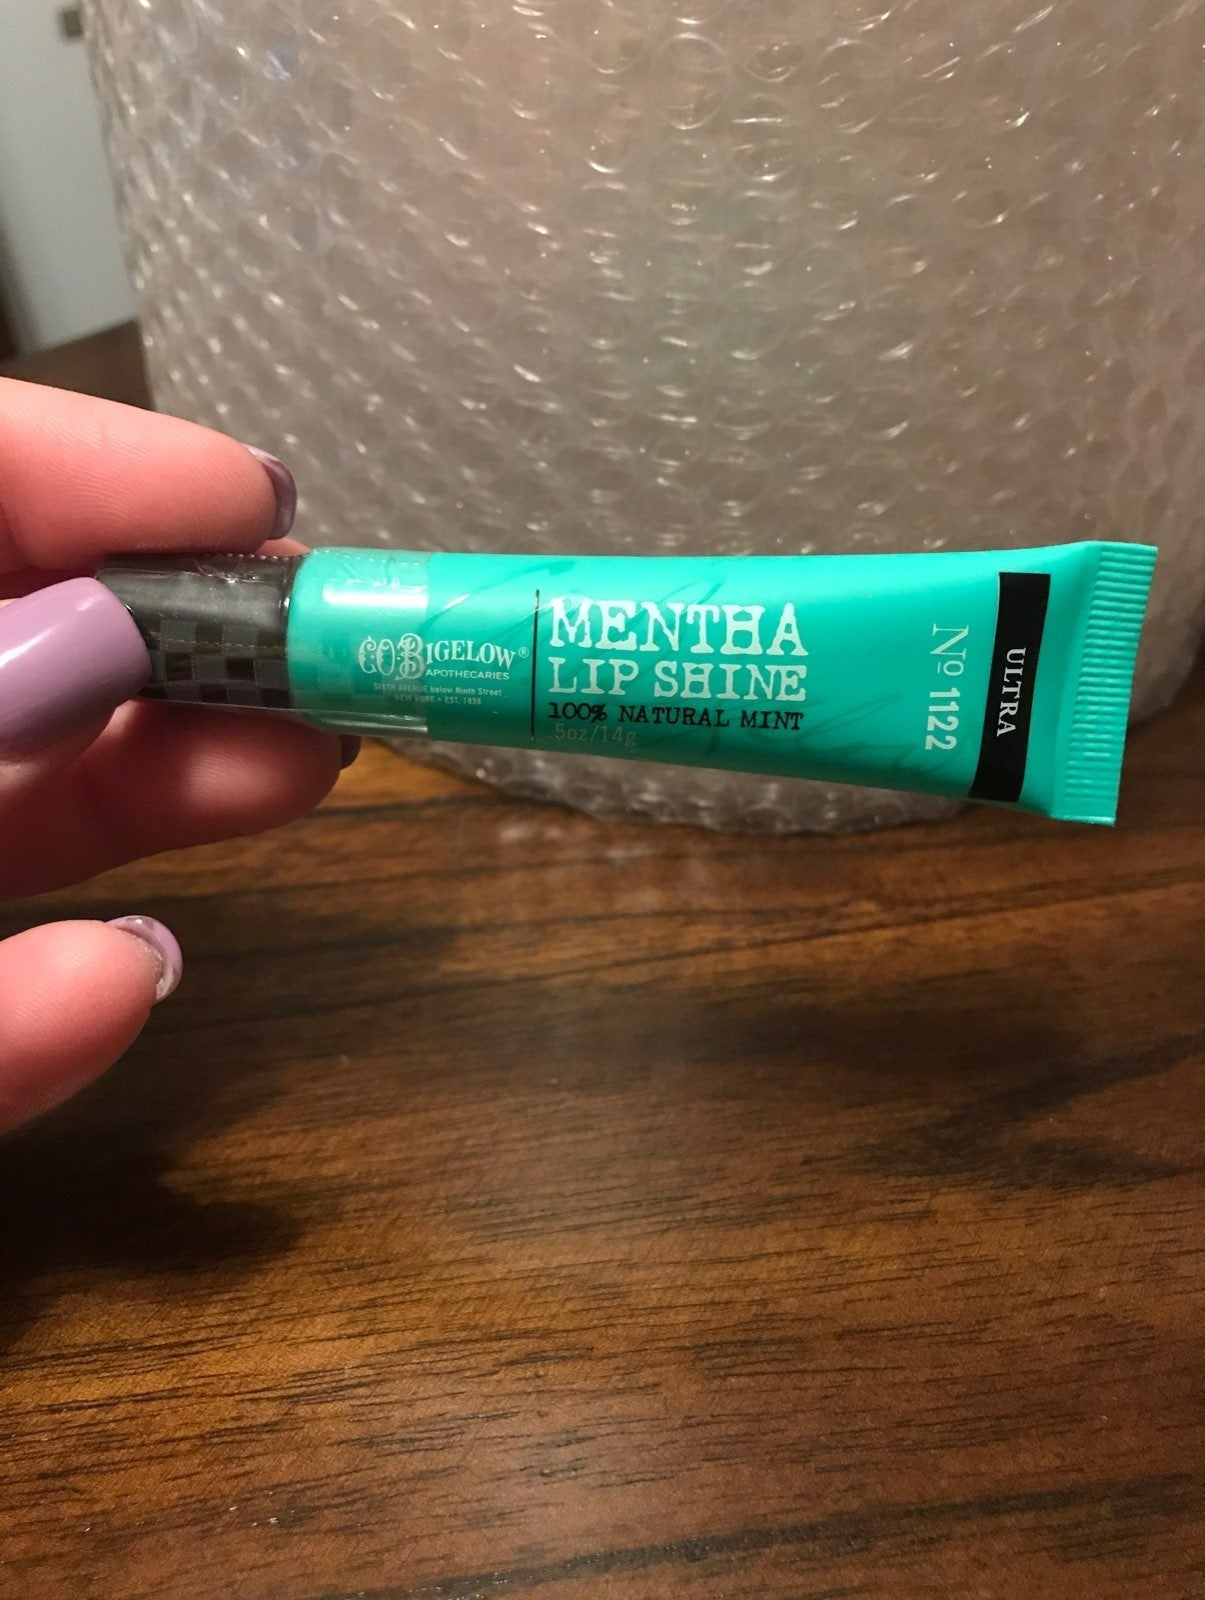 CO Bigelow Mentha Lip Shine- Ultra